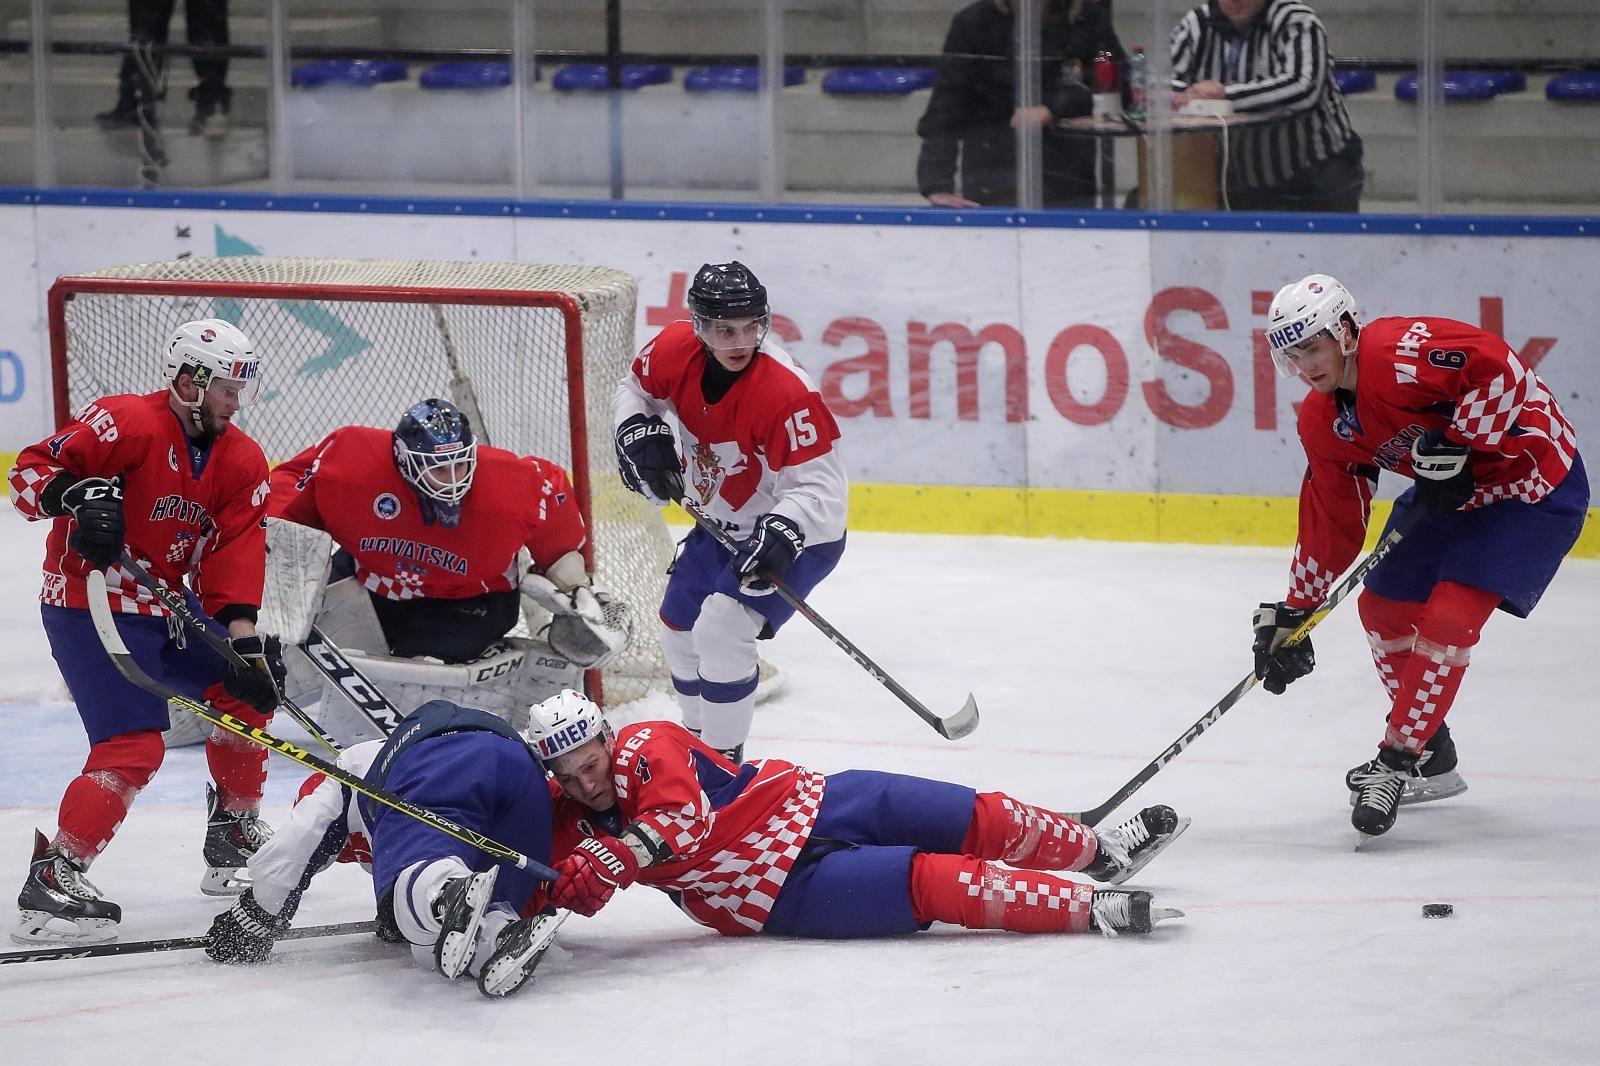 Otkazano Svjetsko prvenstvo u hokeju na ledu